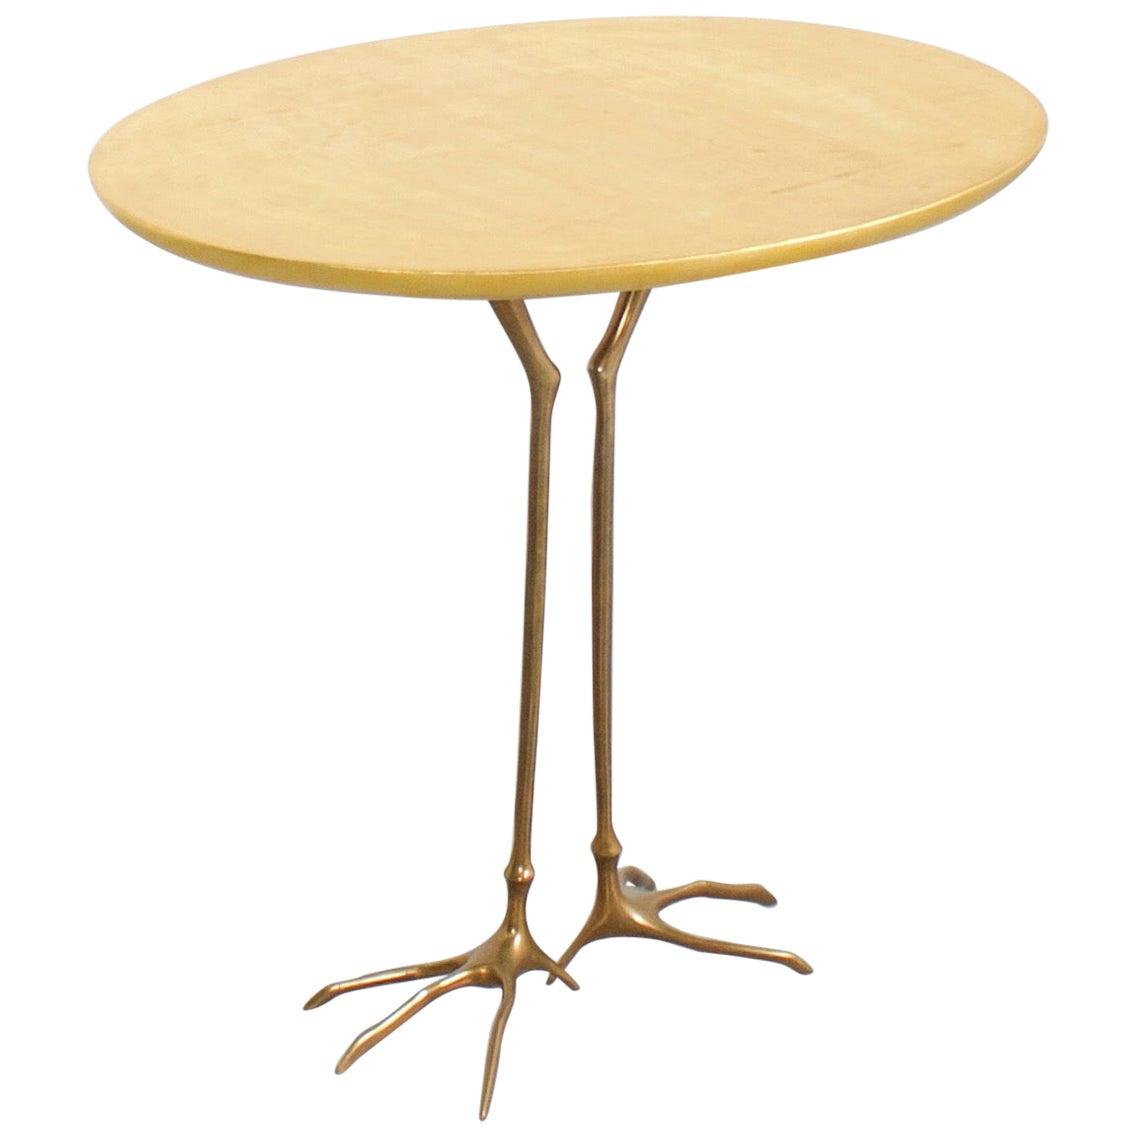 Table 'Traccia' by Meret Oppenheim for Simon Gavina, Italy, 1972